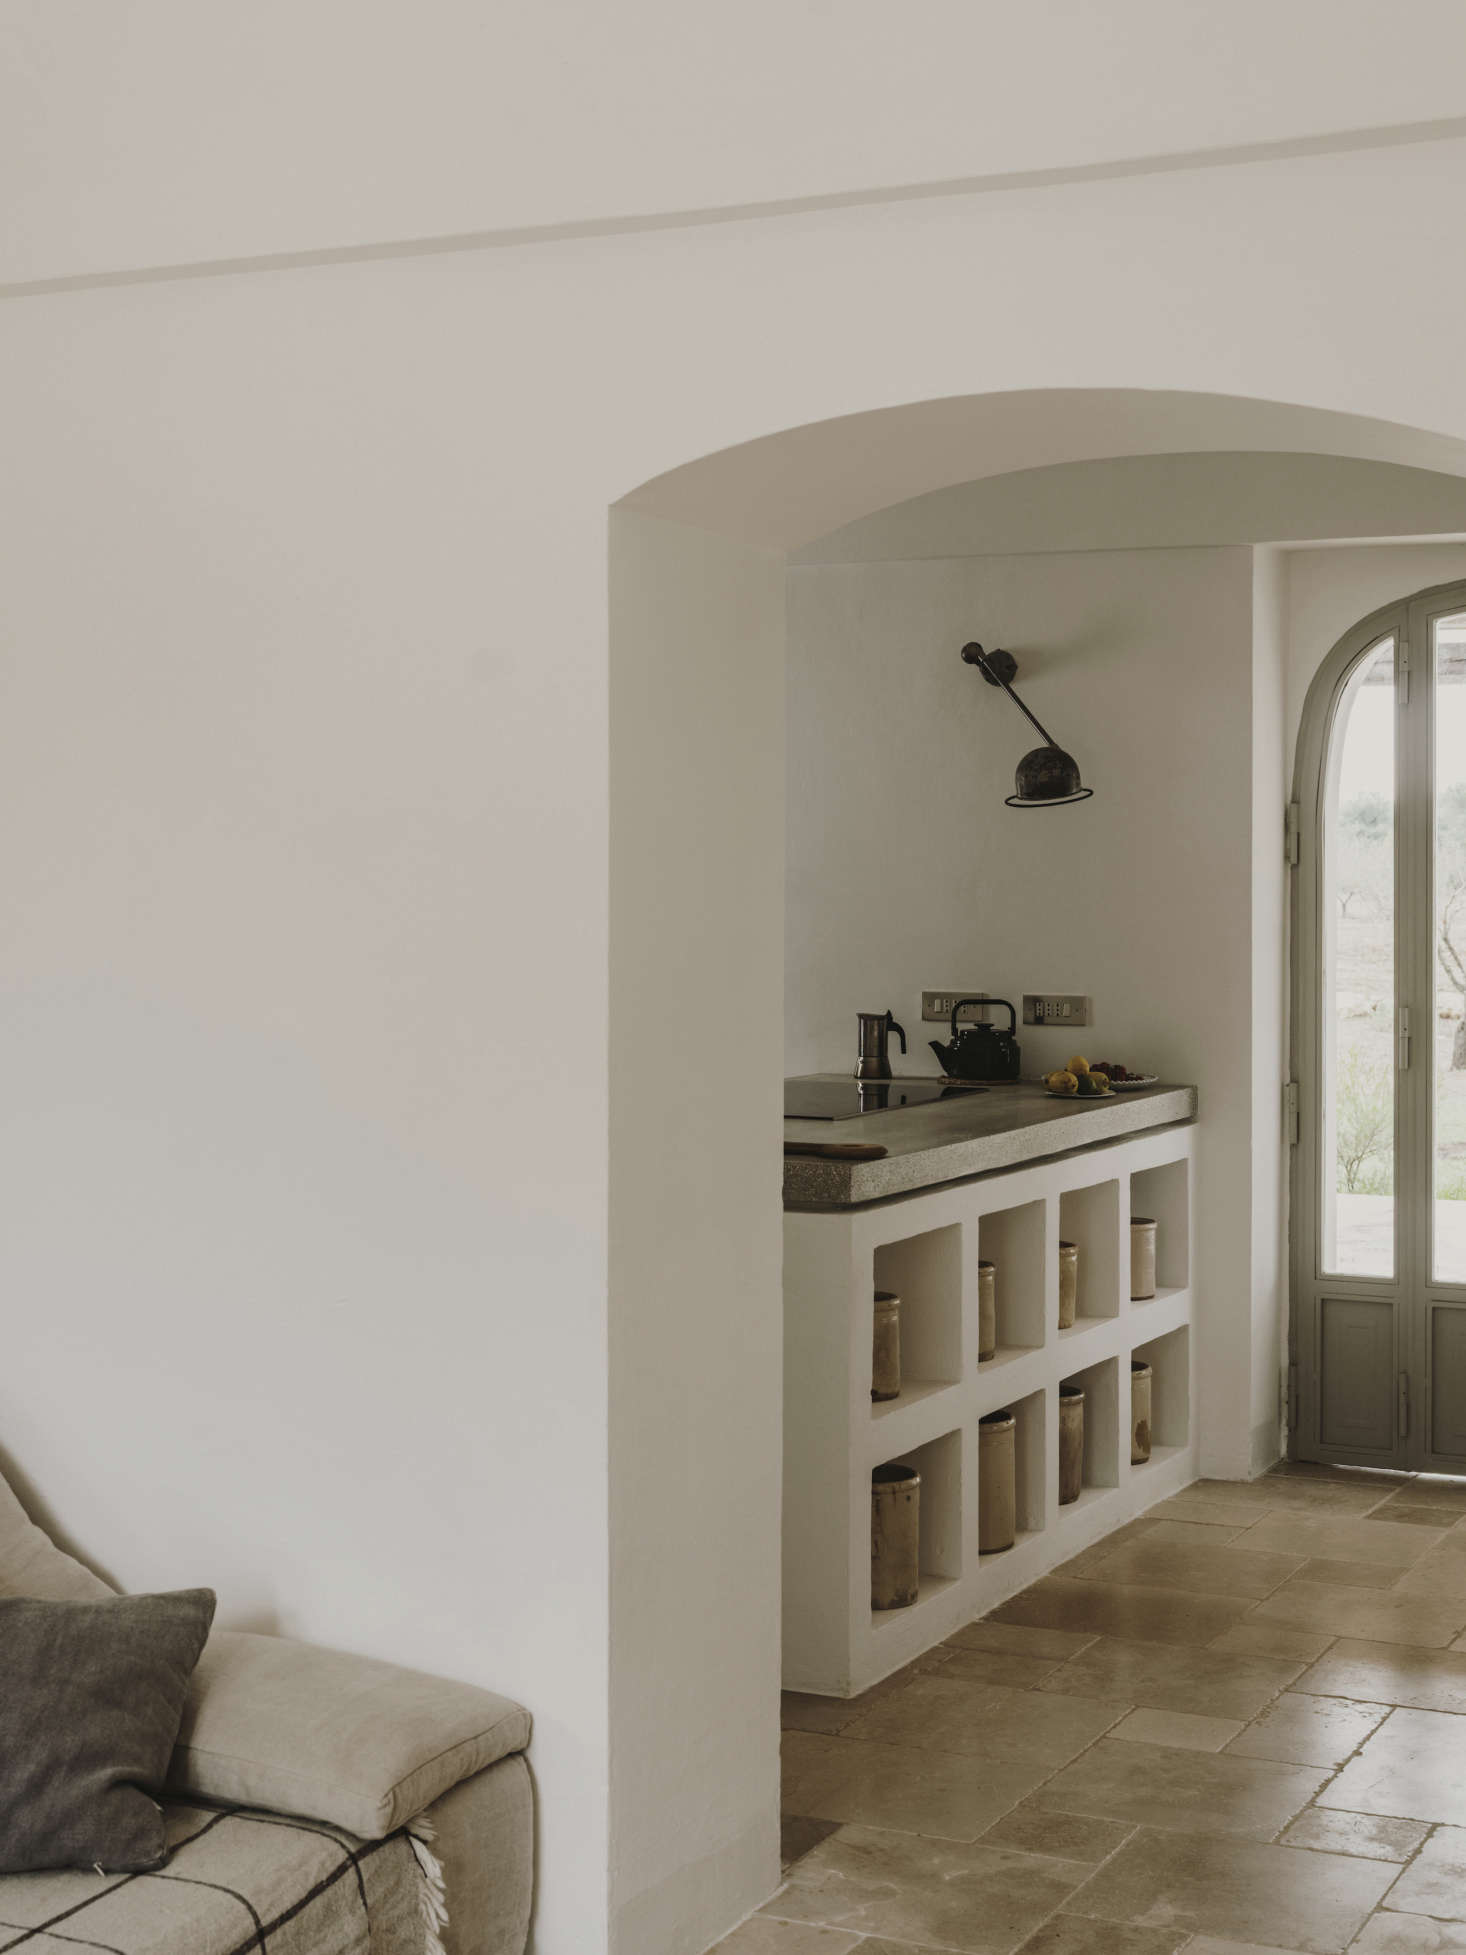 Through an archway into the villa's kitchen.